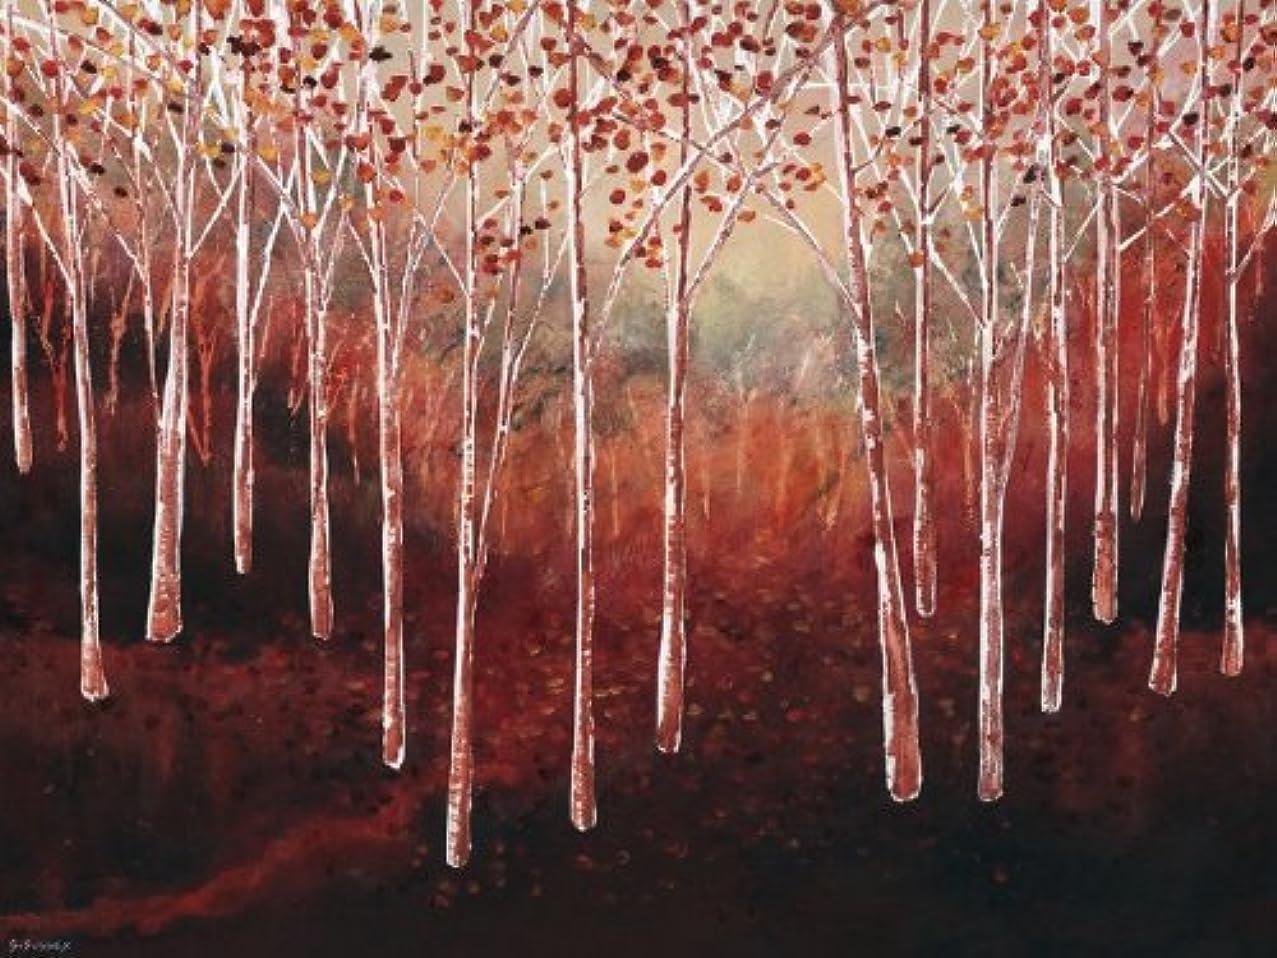 Serena Sussex 60 x 80 cm Magical Woodlands Canvas